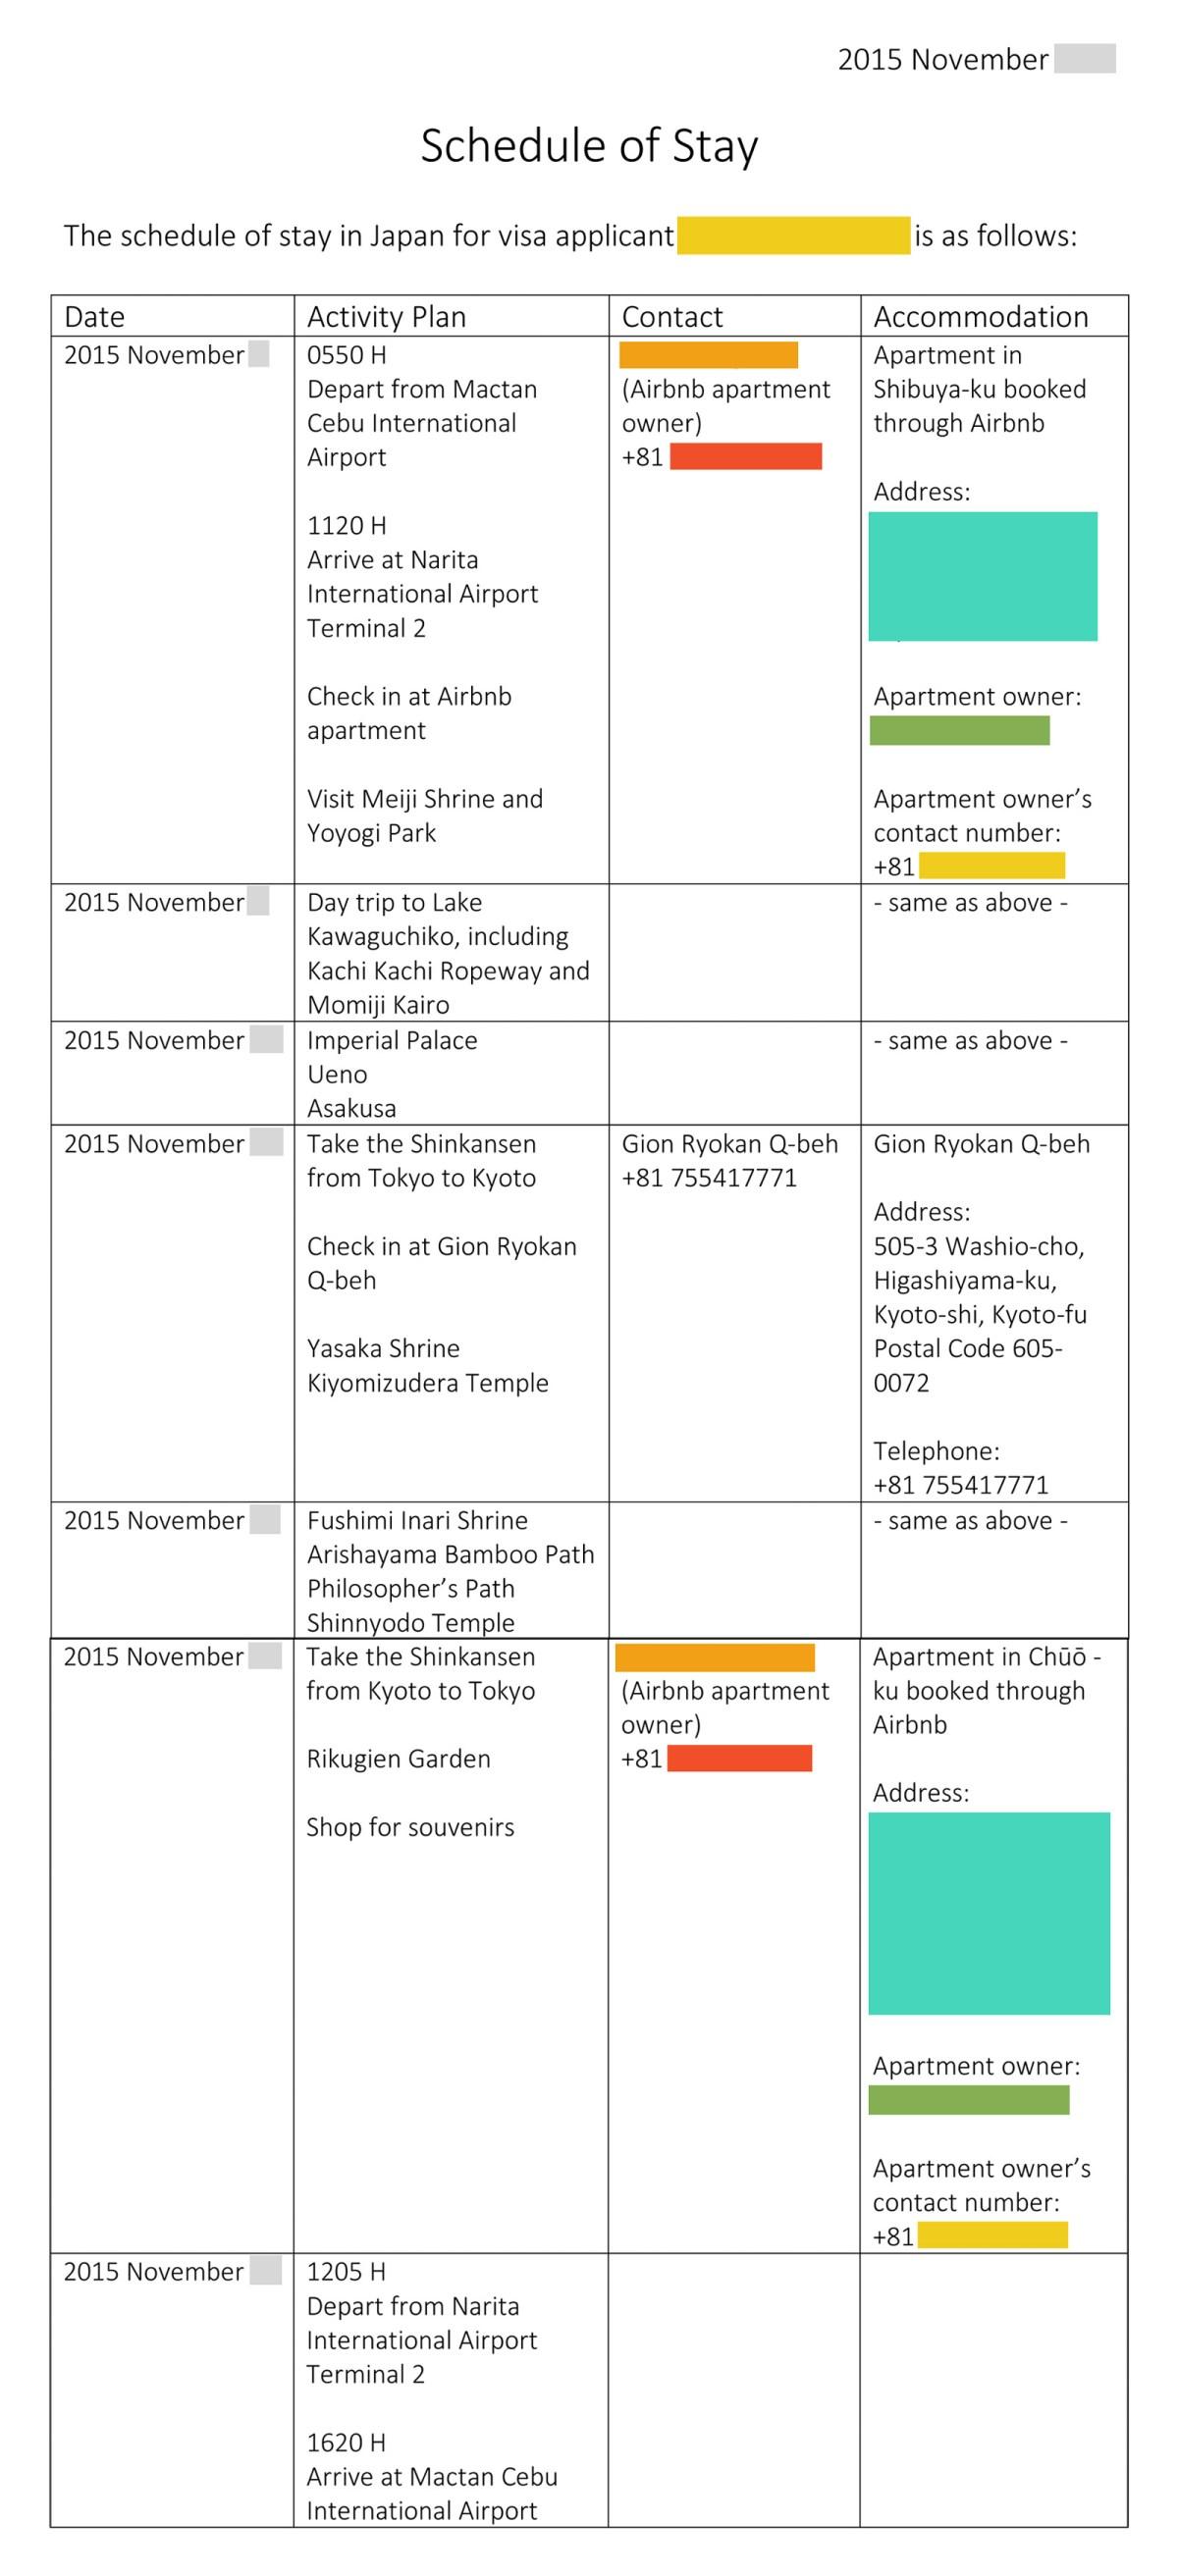 SGMT Japan Visa_Schedule of Stay_Sample